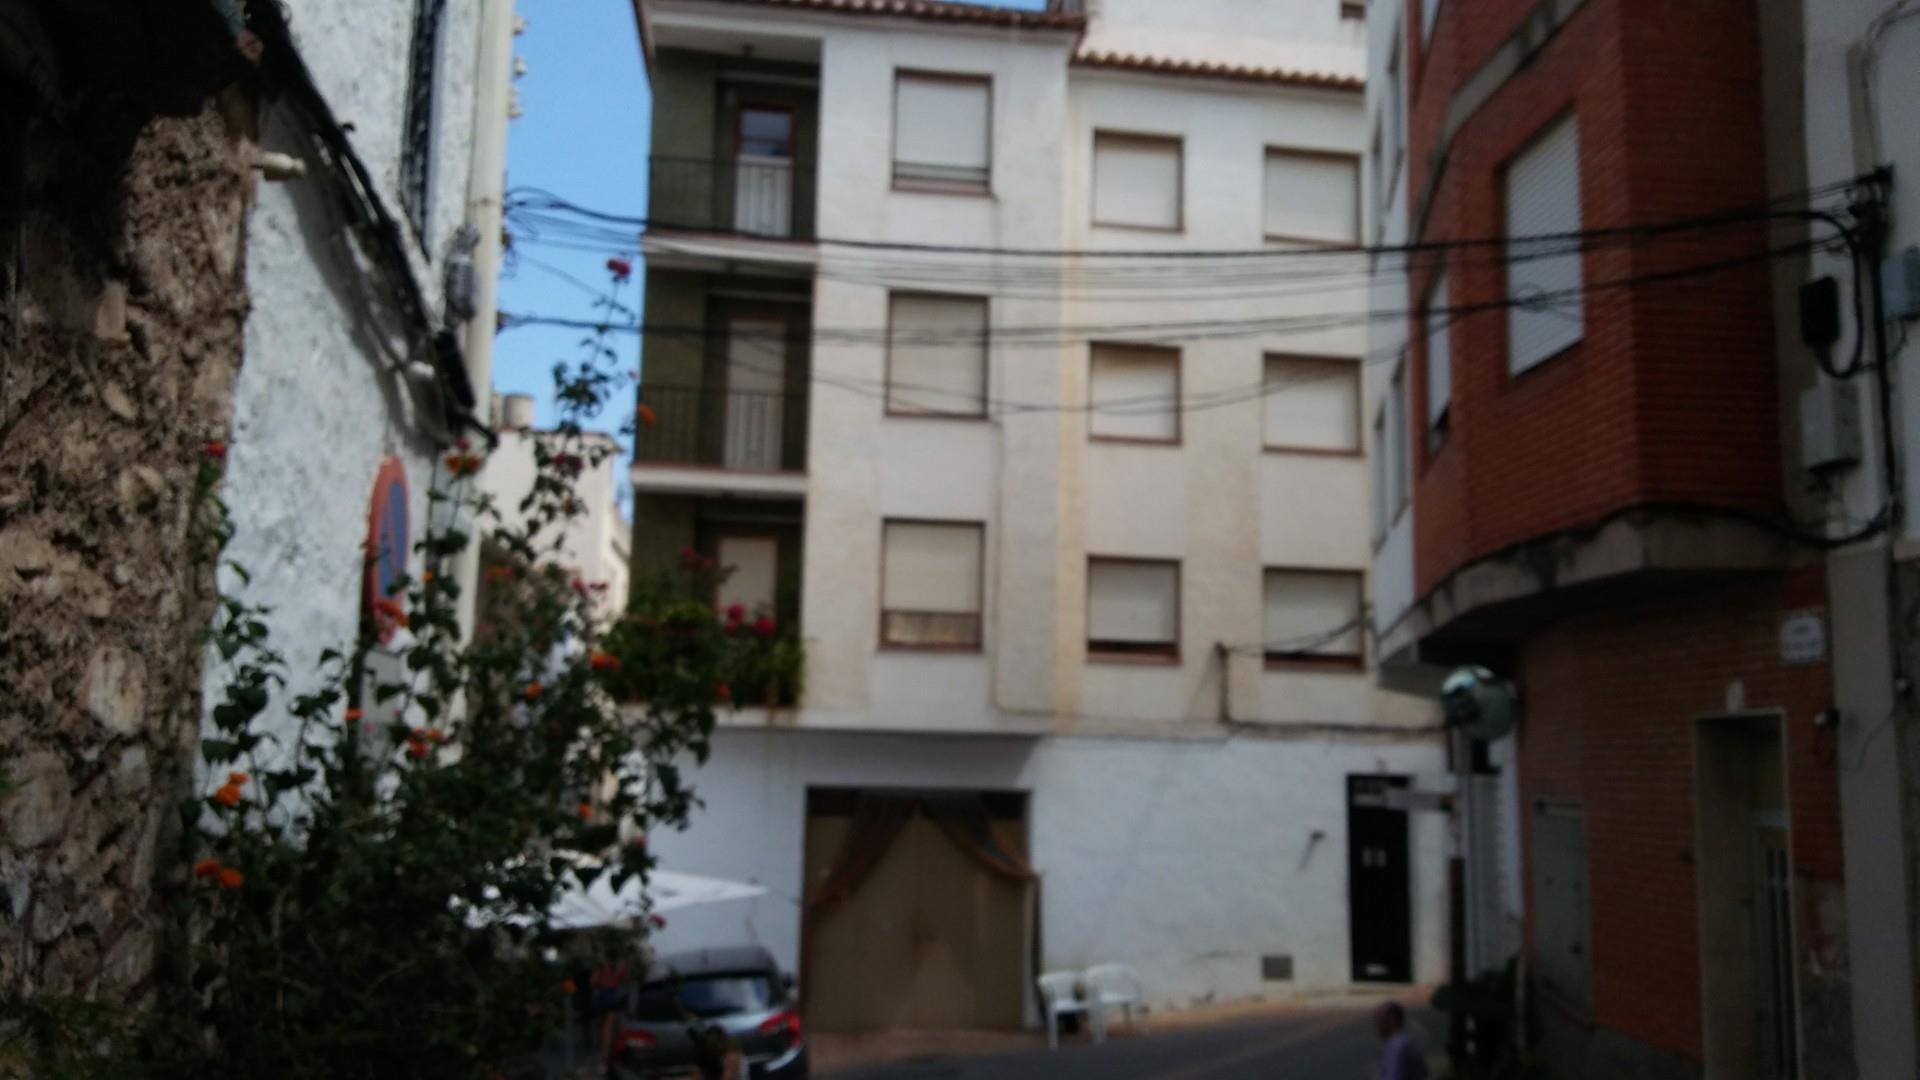 Etagenwohnung  Calle san antonio. Eslida / calle san antonio